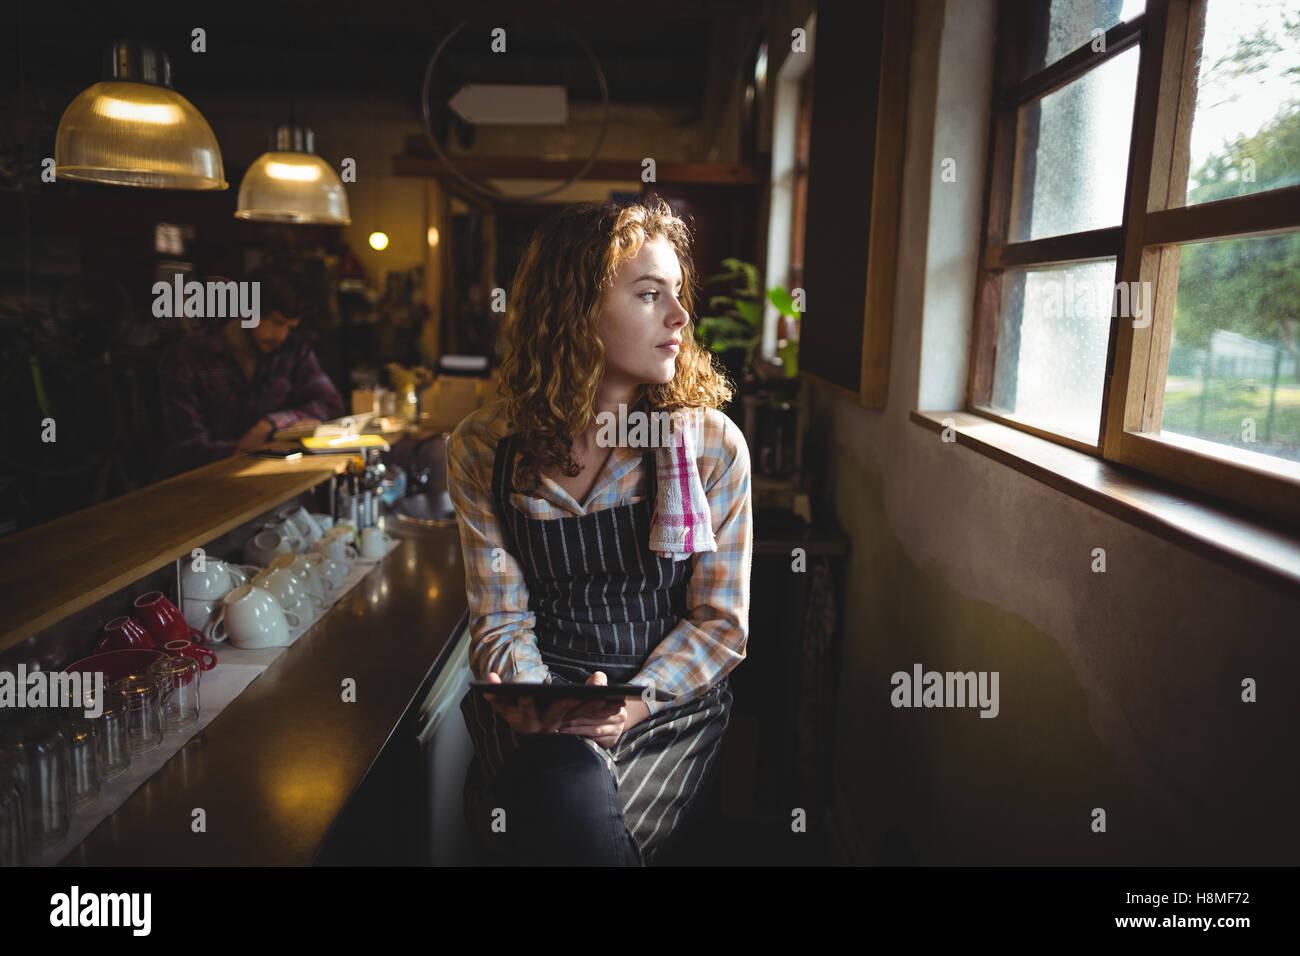 Thoughtful waitress looking through window - Stock Image